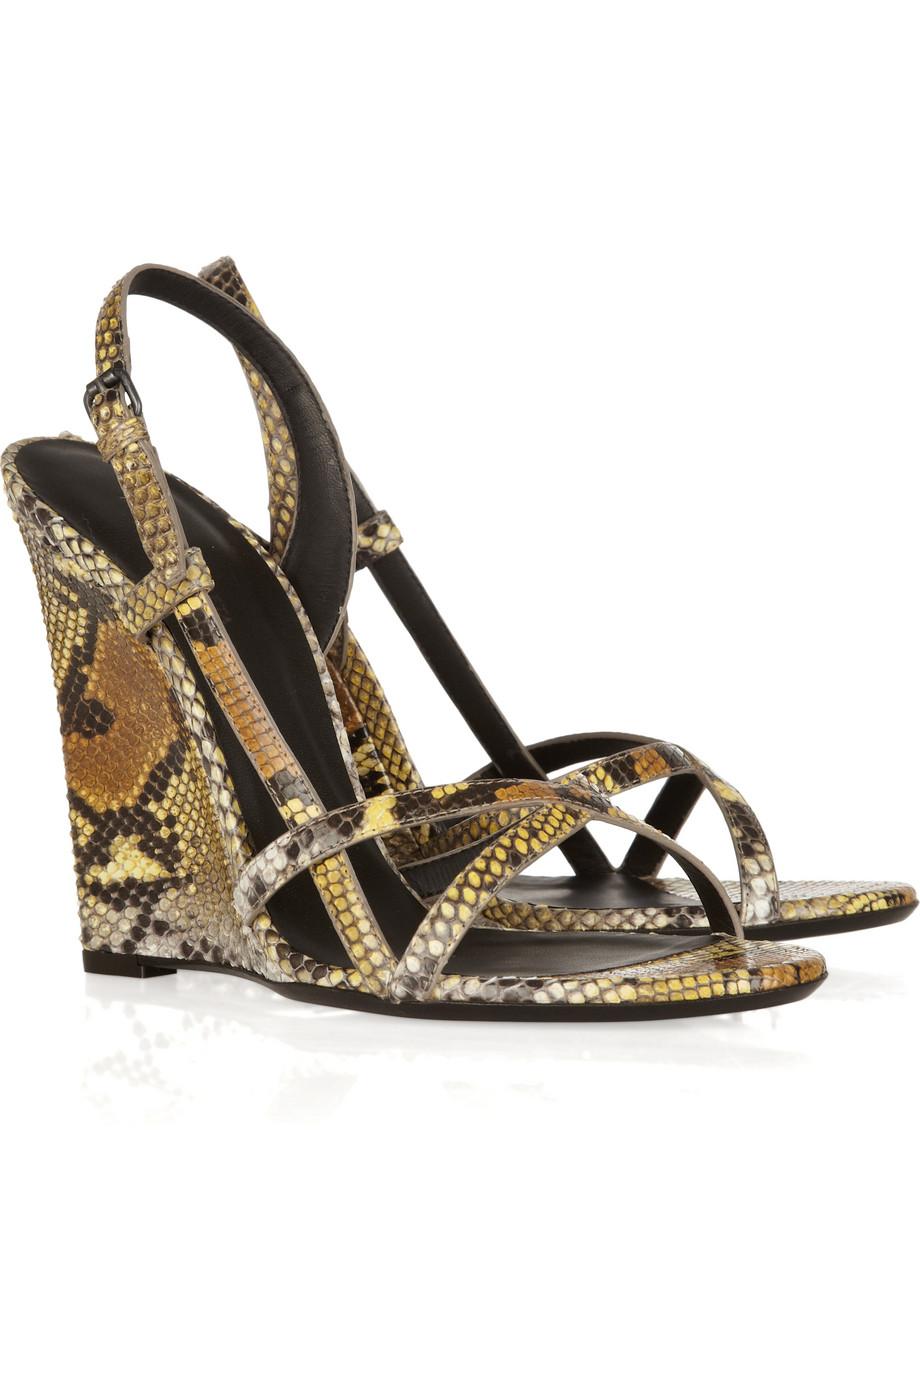 release dates sale online Bottega Veneta Canvas Platform Wedge Sandals free shipping big discount discount shopping online zjr9zd56VN